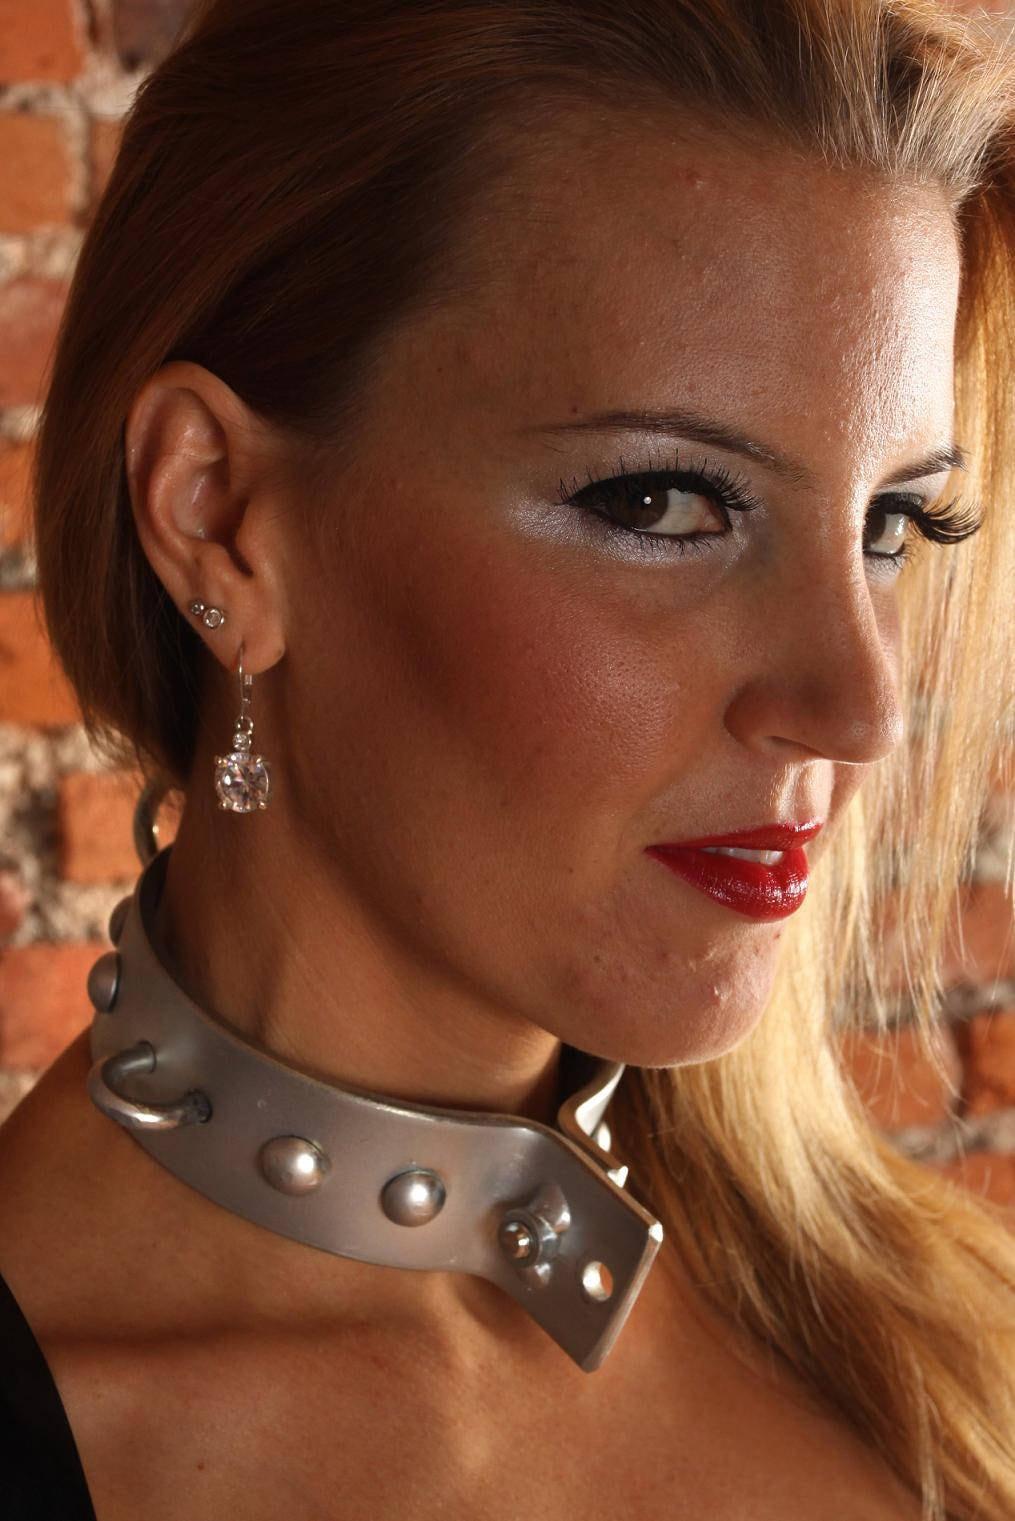 Terginum Bdsm Dungeon Metal Collar Necklace Necklace Necklace-9923